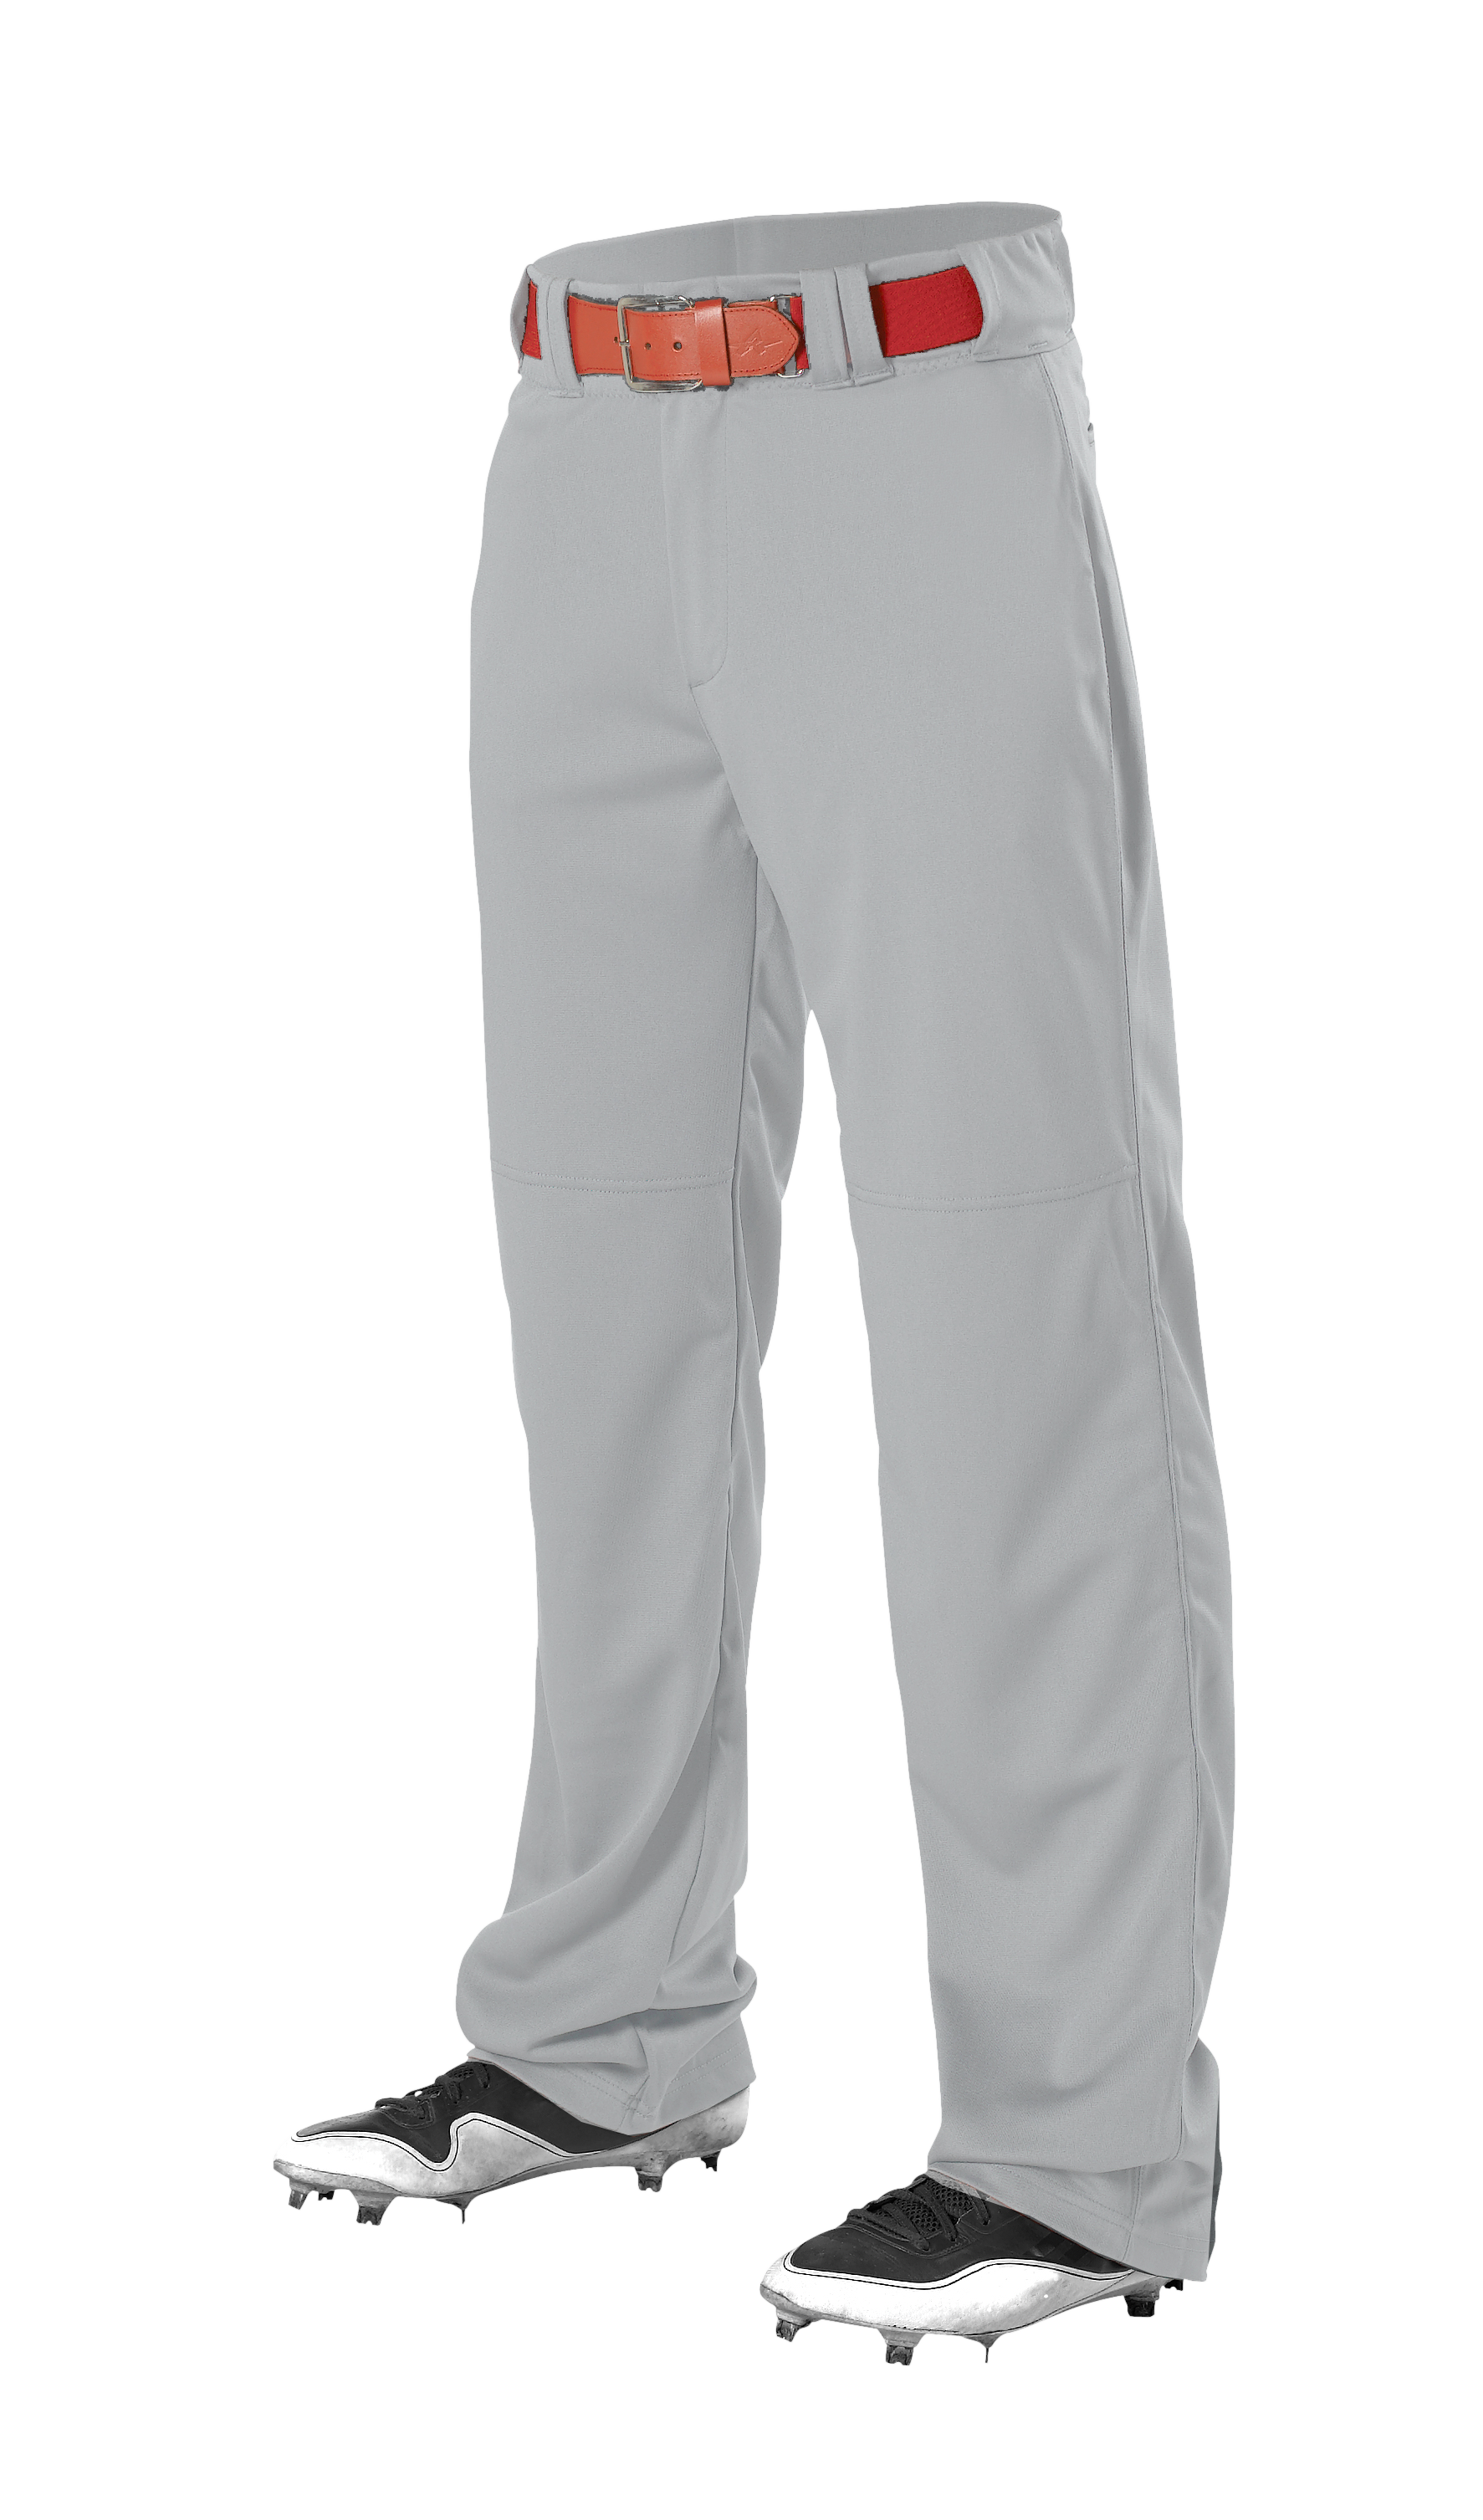 Adult Adjustable Inseam Baseball Pant - Grey